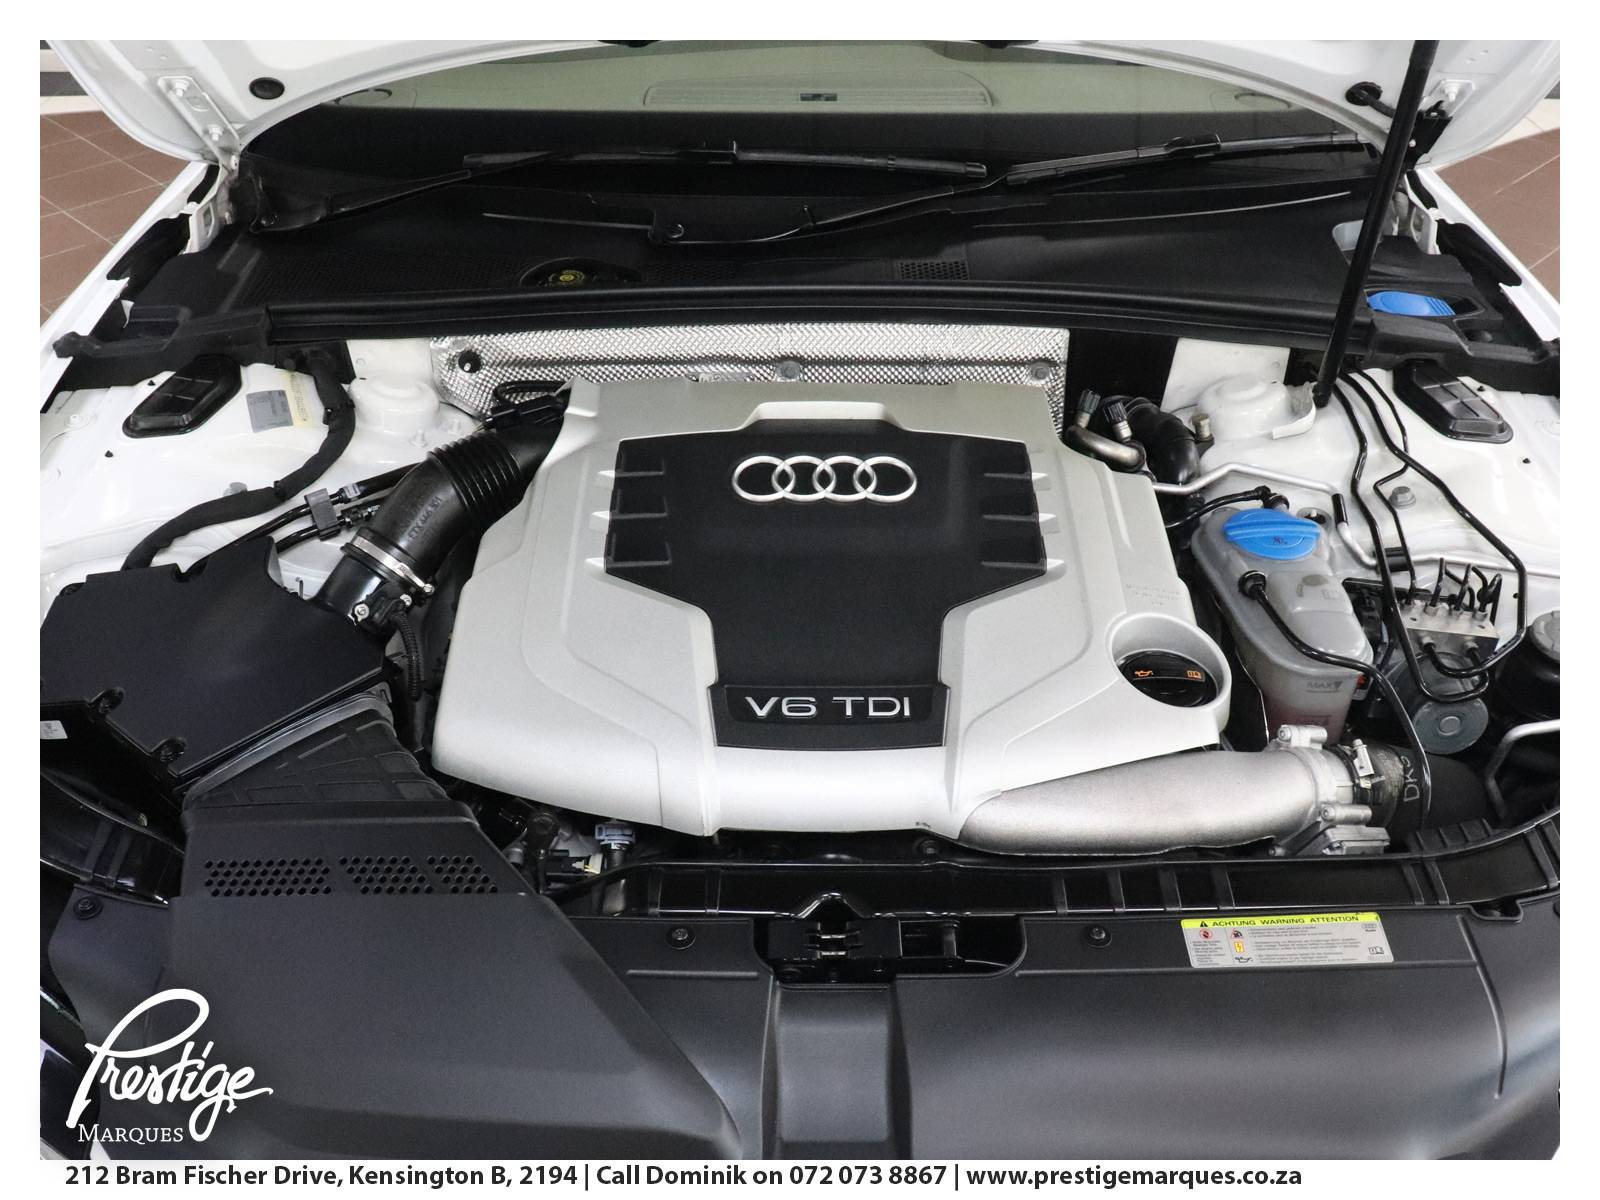 2011-Audi-A5-3.0-TDI-Quattro-Stronic-Prestige-Marques-Randburg-Sandton-8